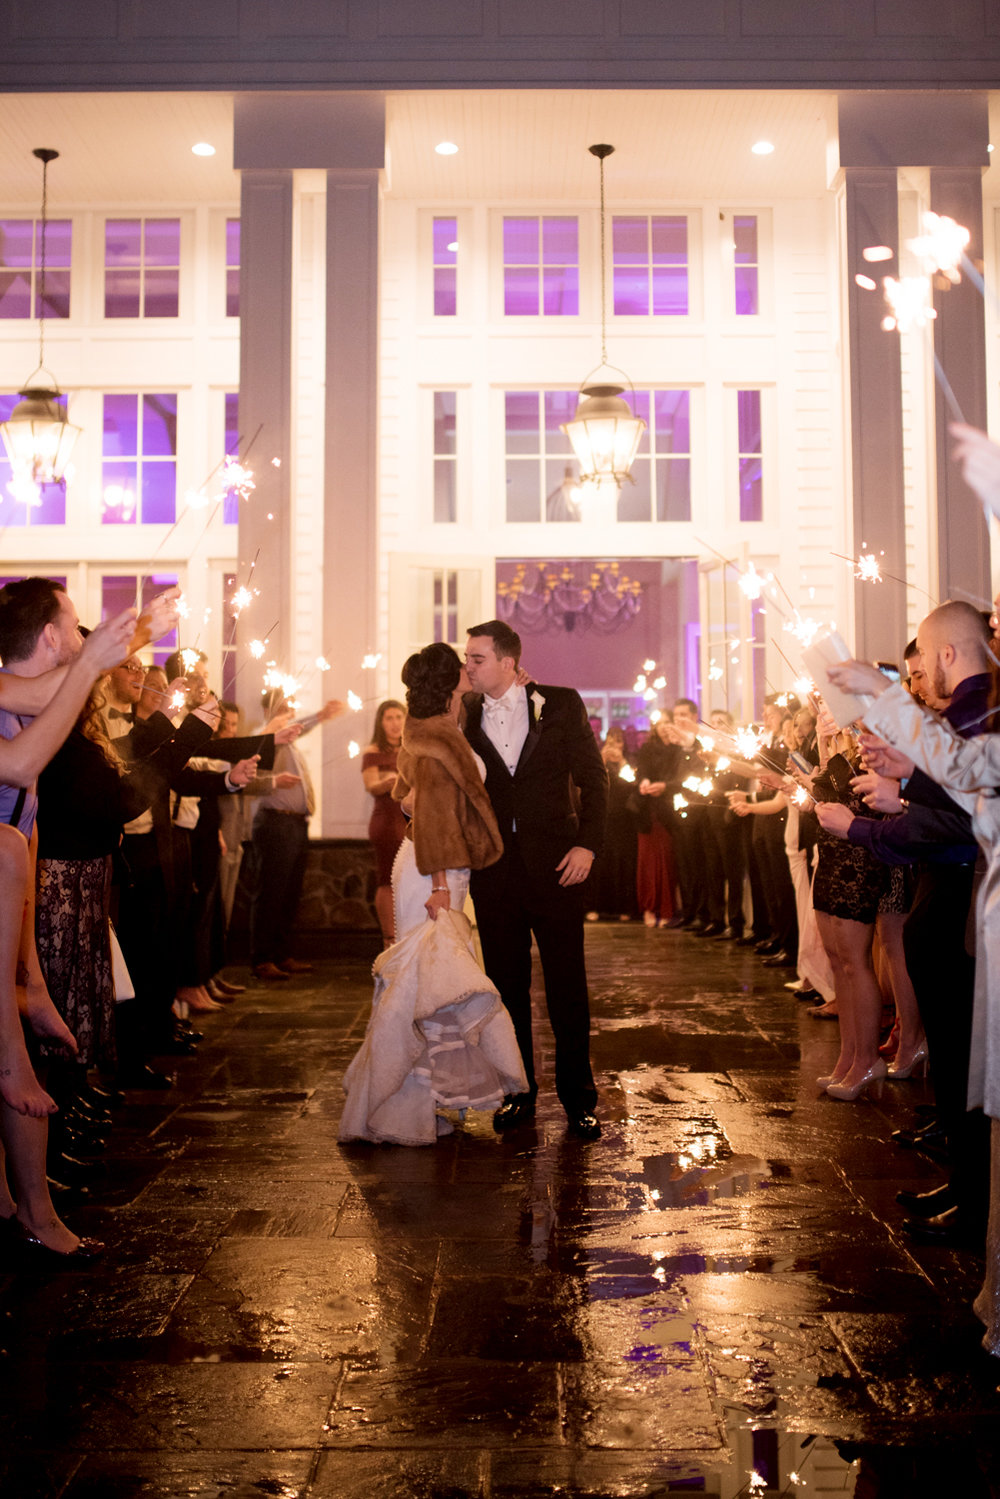 Michelle+Joe- Ryland Inn Wedding- New Jersey-Olivia Christina Photo - BLOG-546.JPG